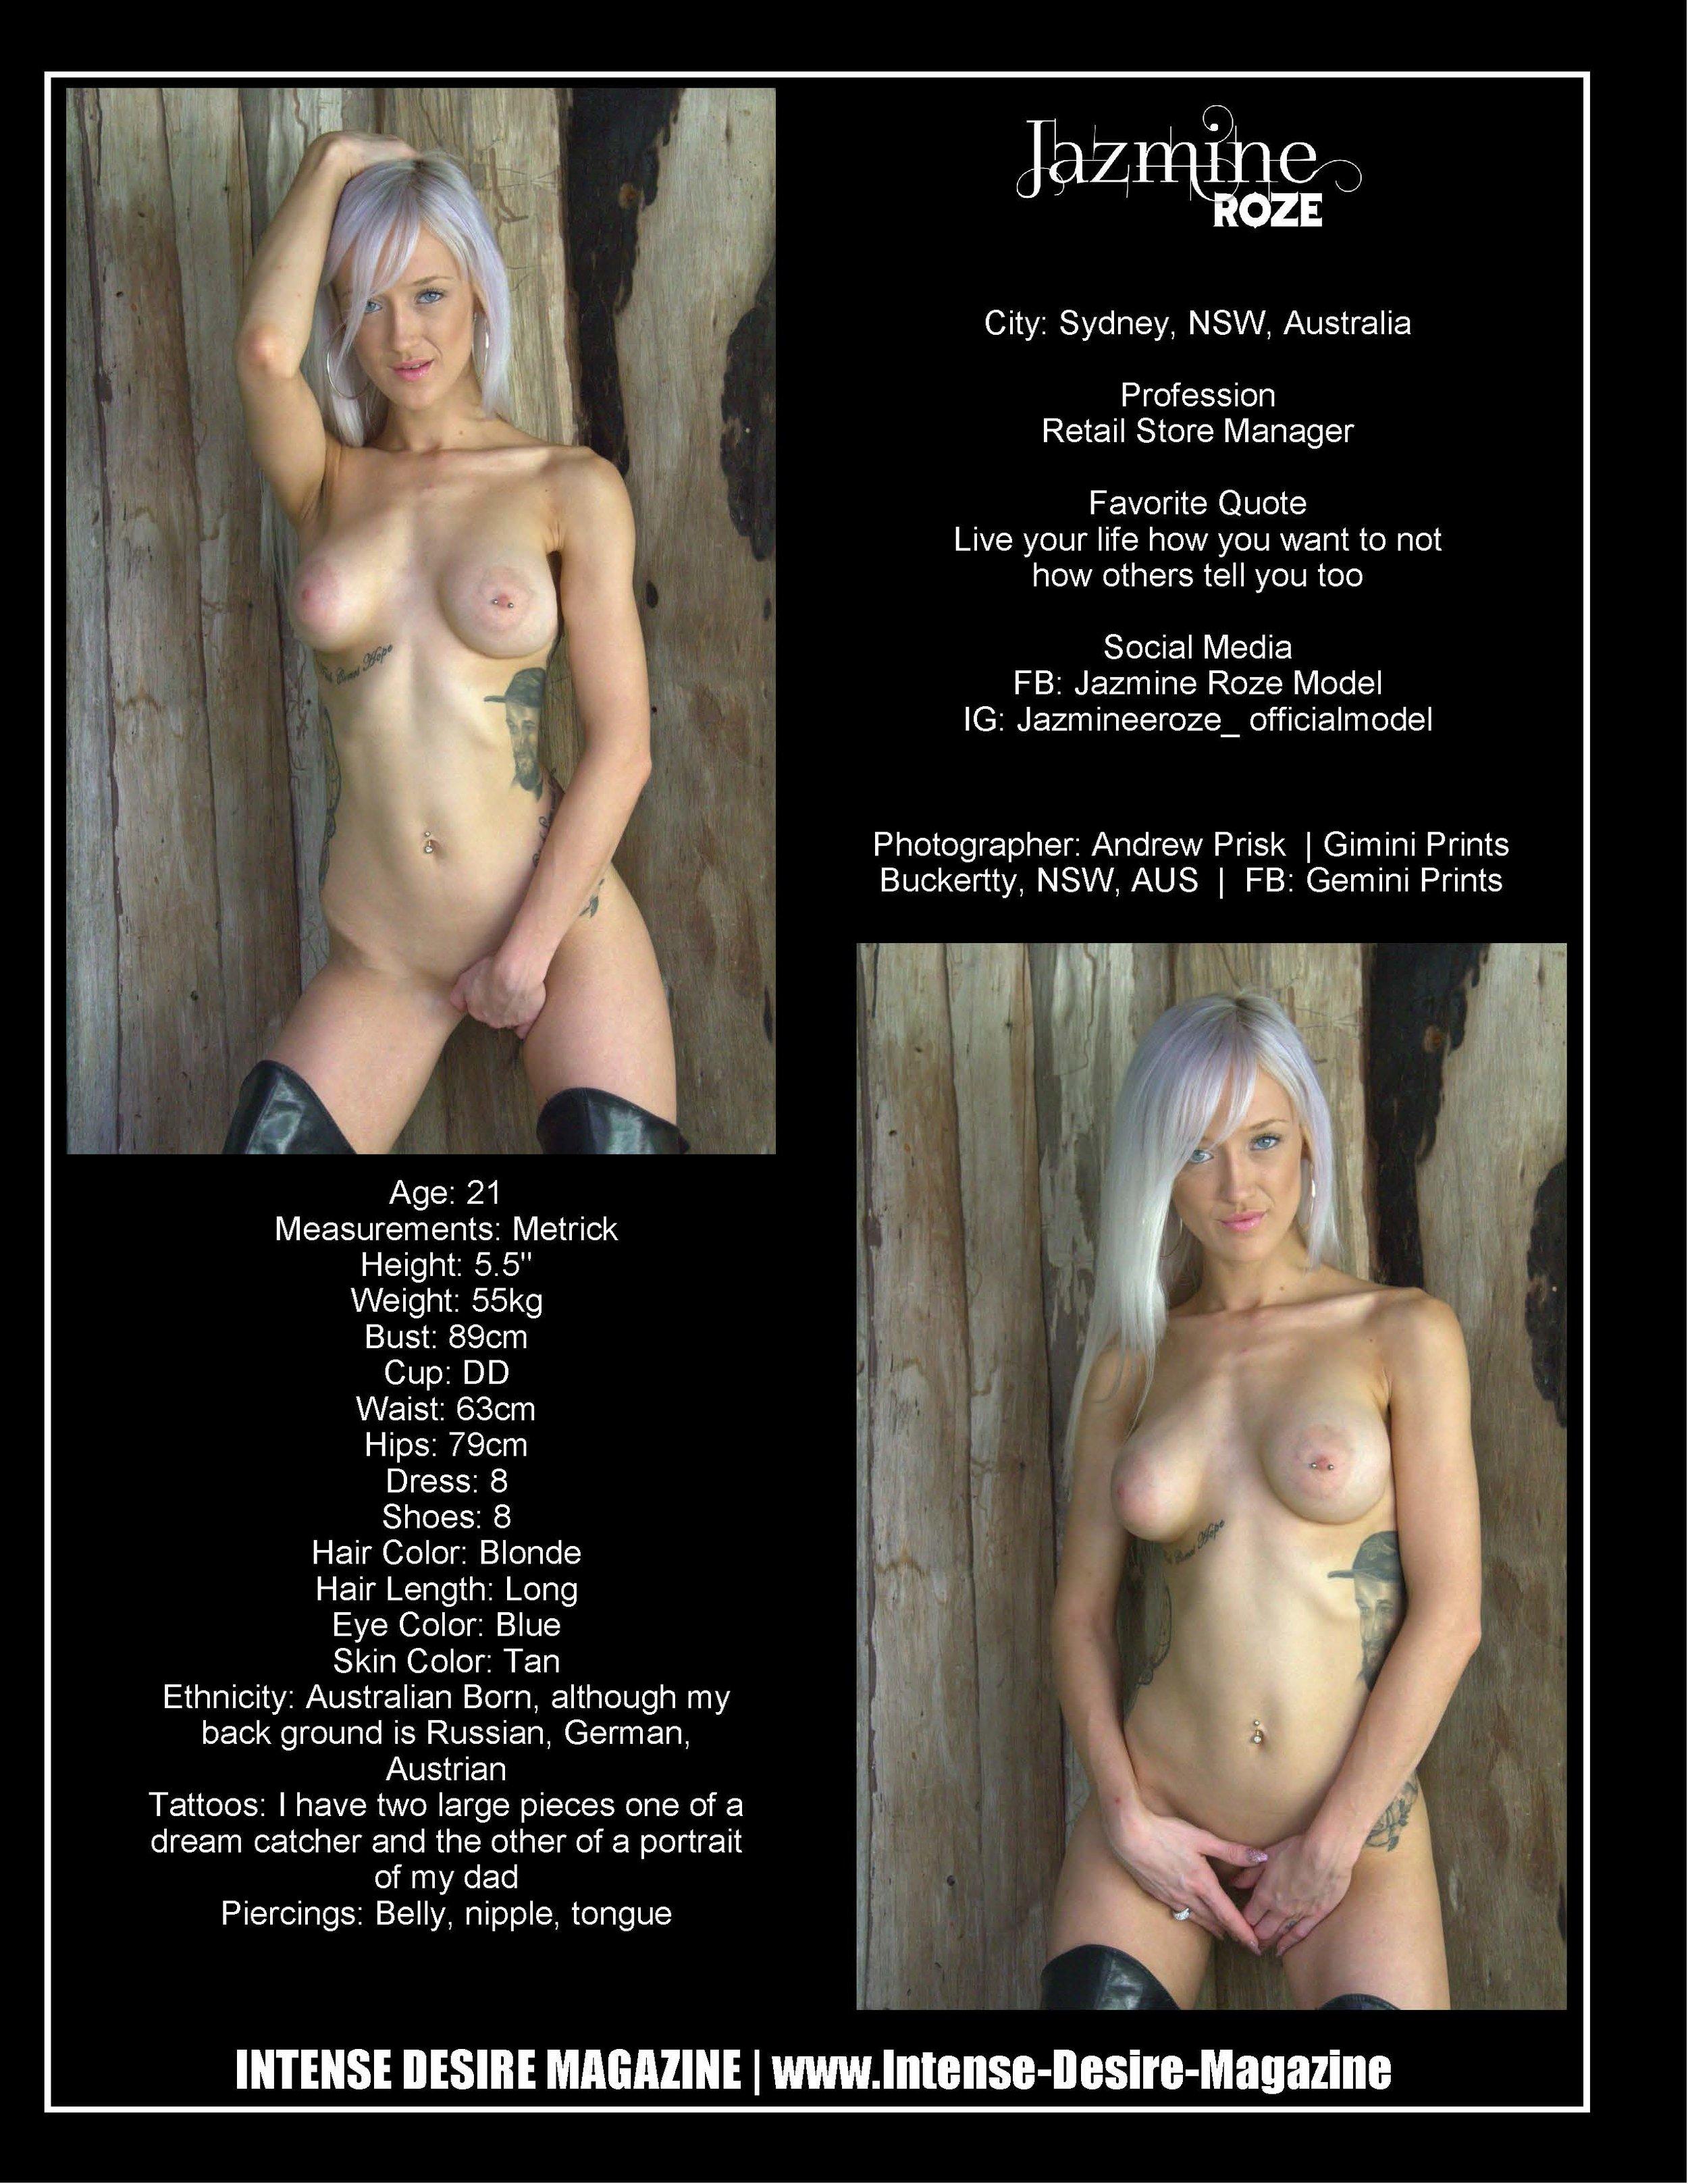 Jazmine Roze - Russia